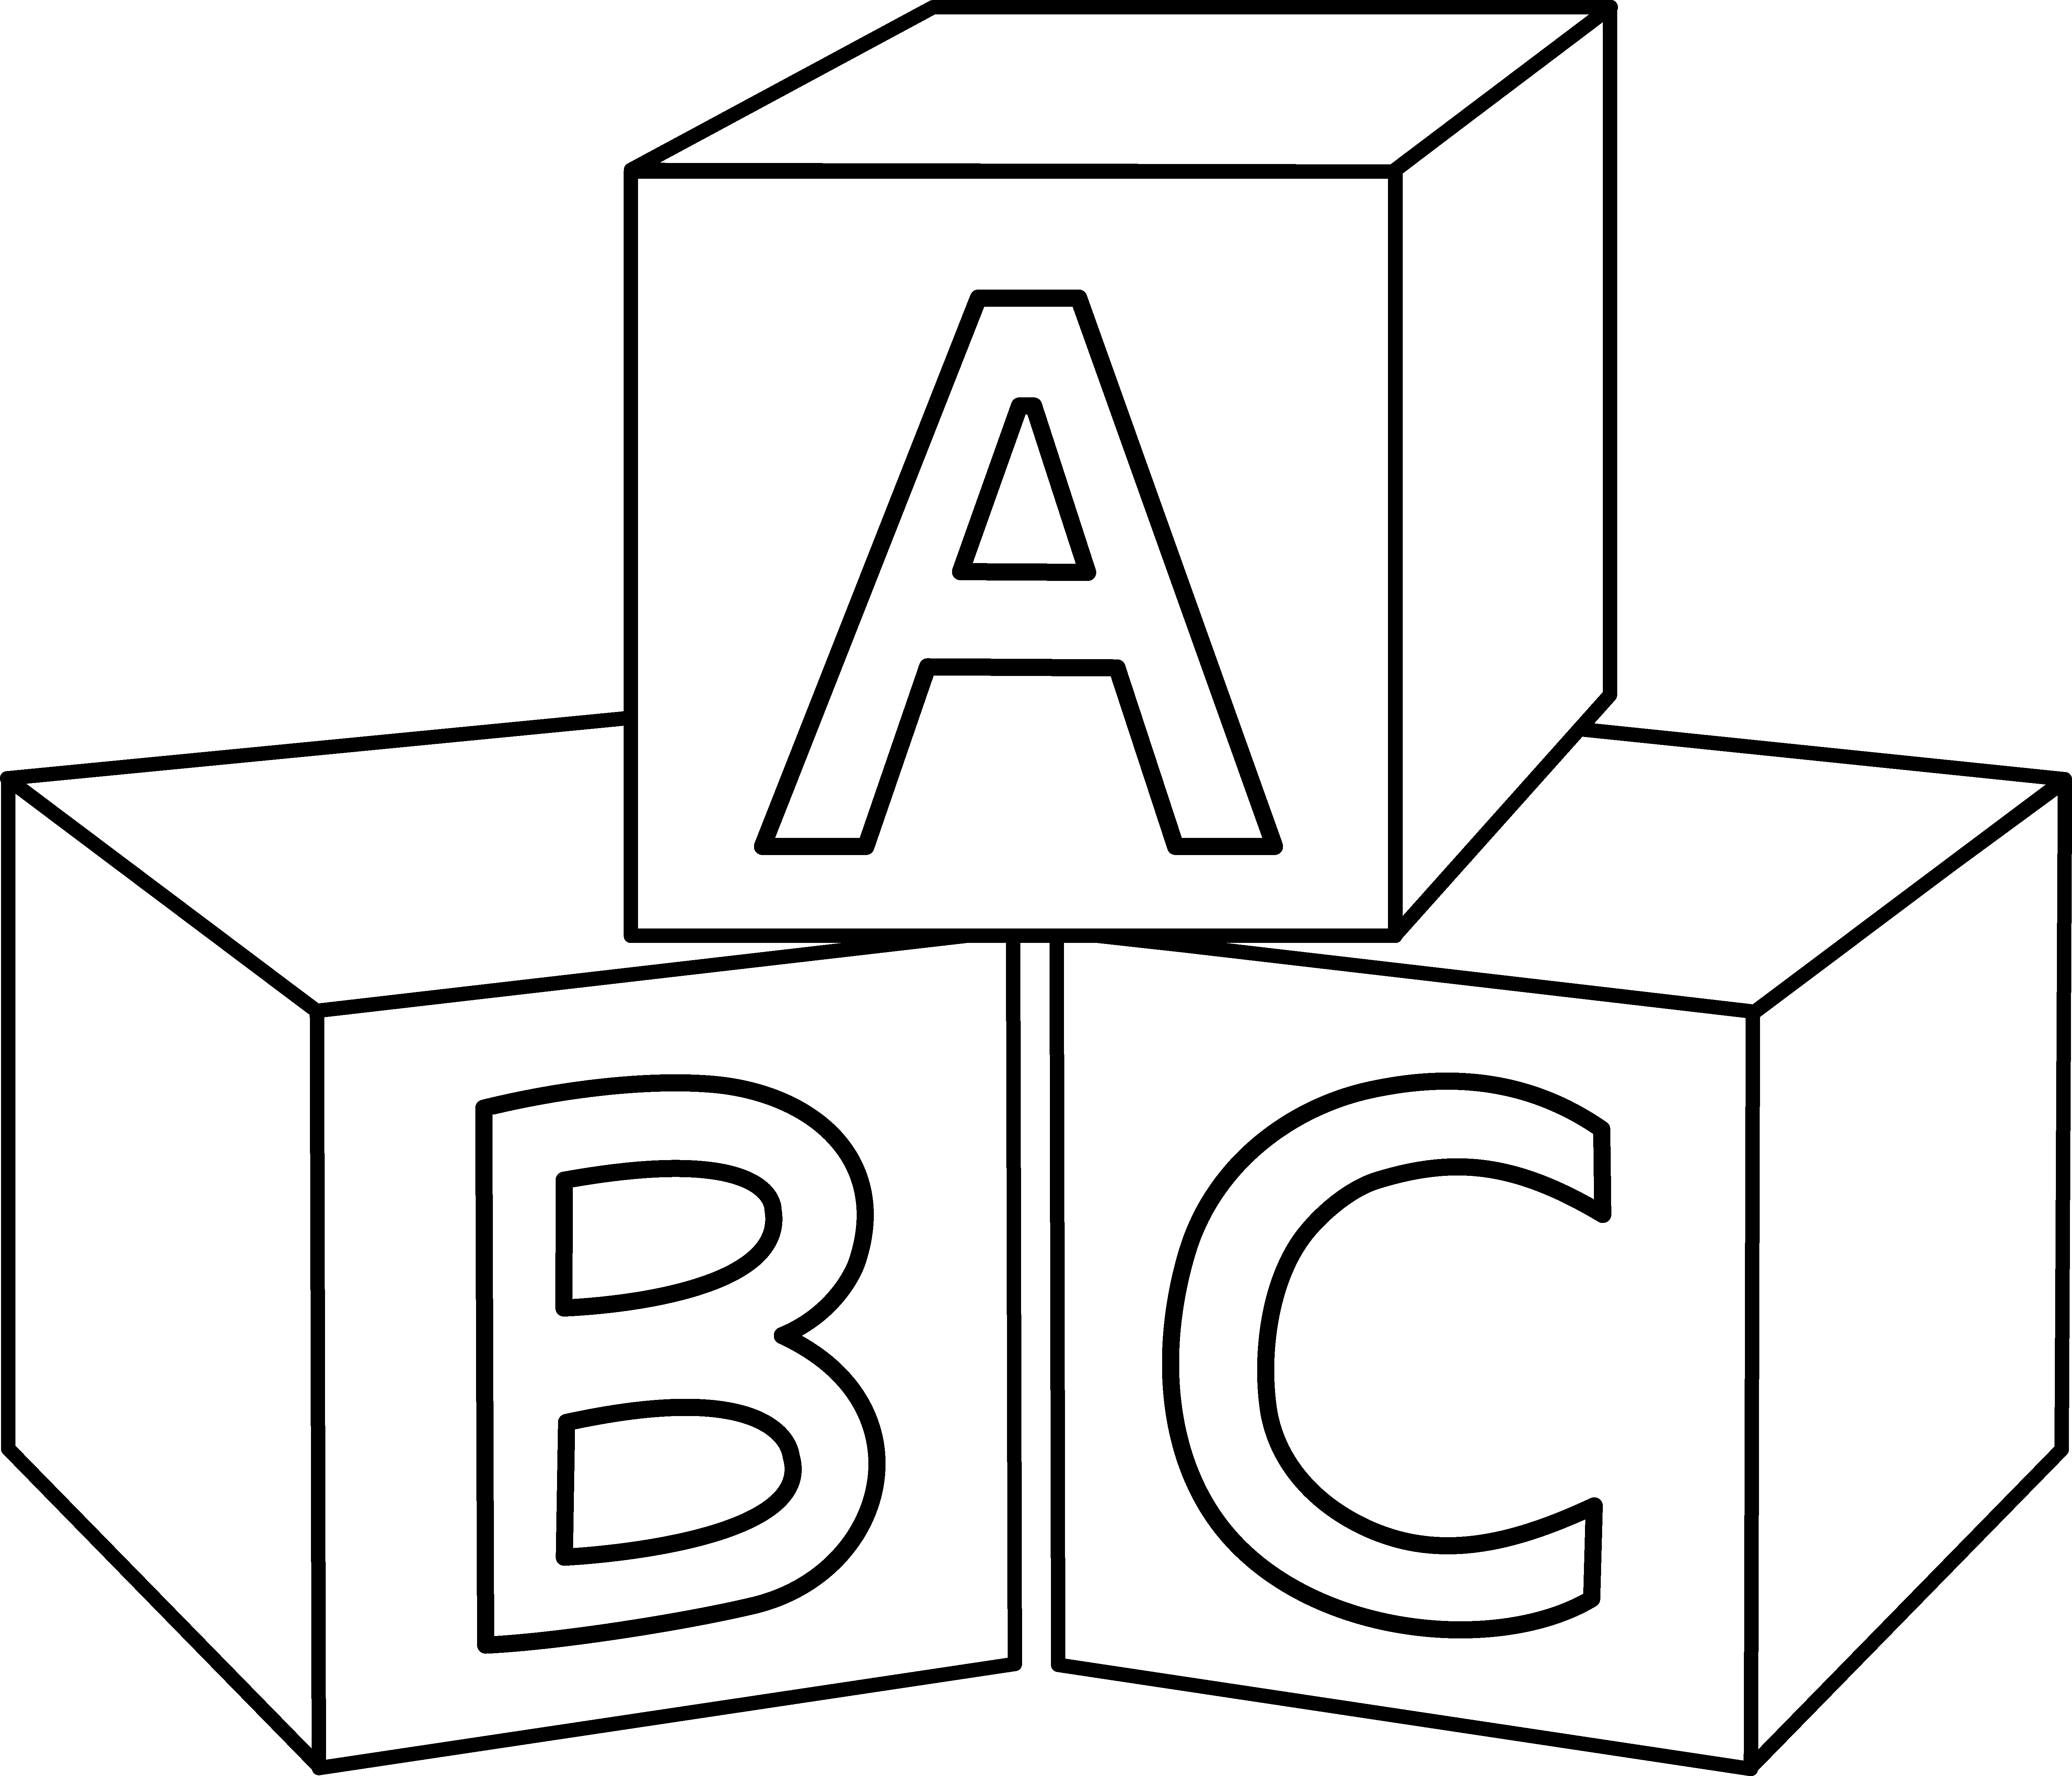 Abc blocks design mirror. Memories clipart black and white